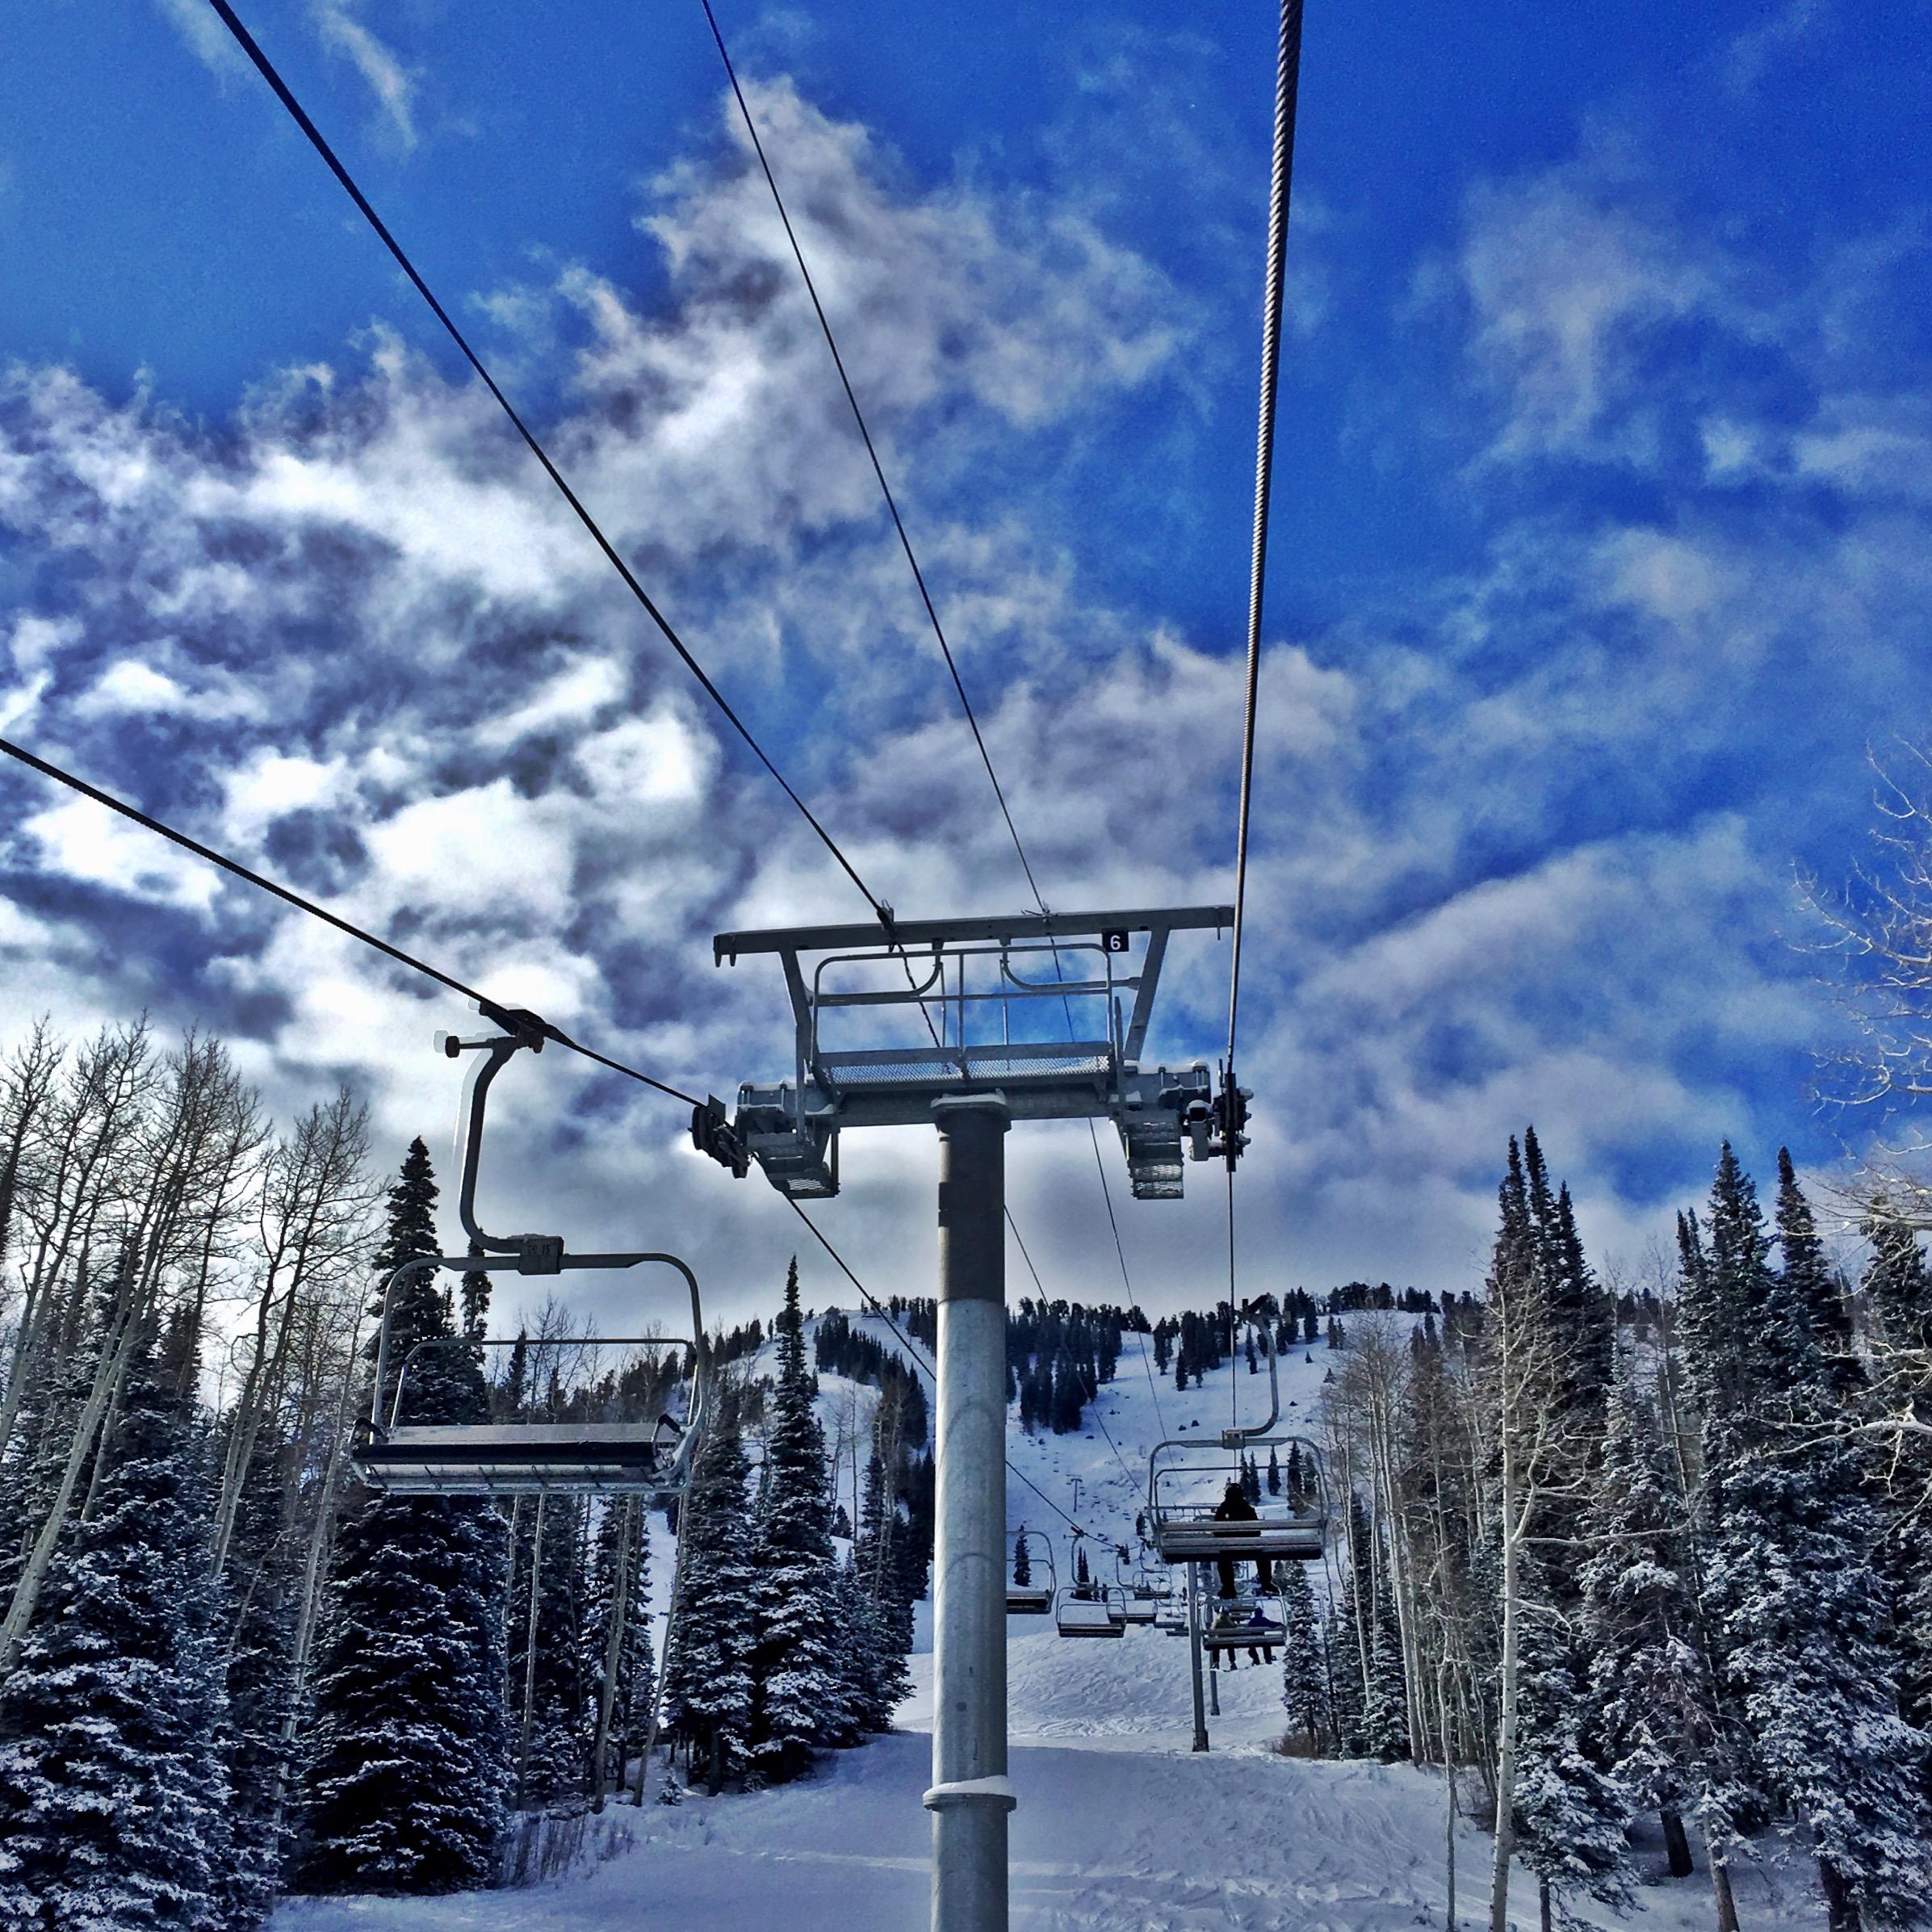 Grungy Slopes, Solitude Utah, Solitude Mountain Resort 22.jpg